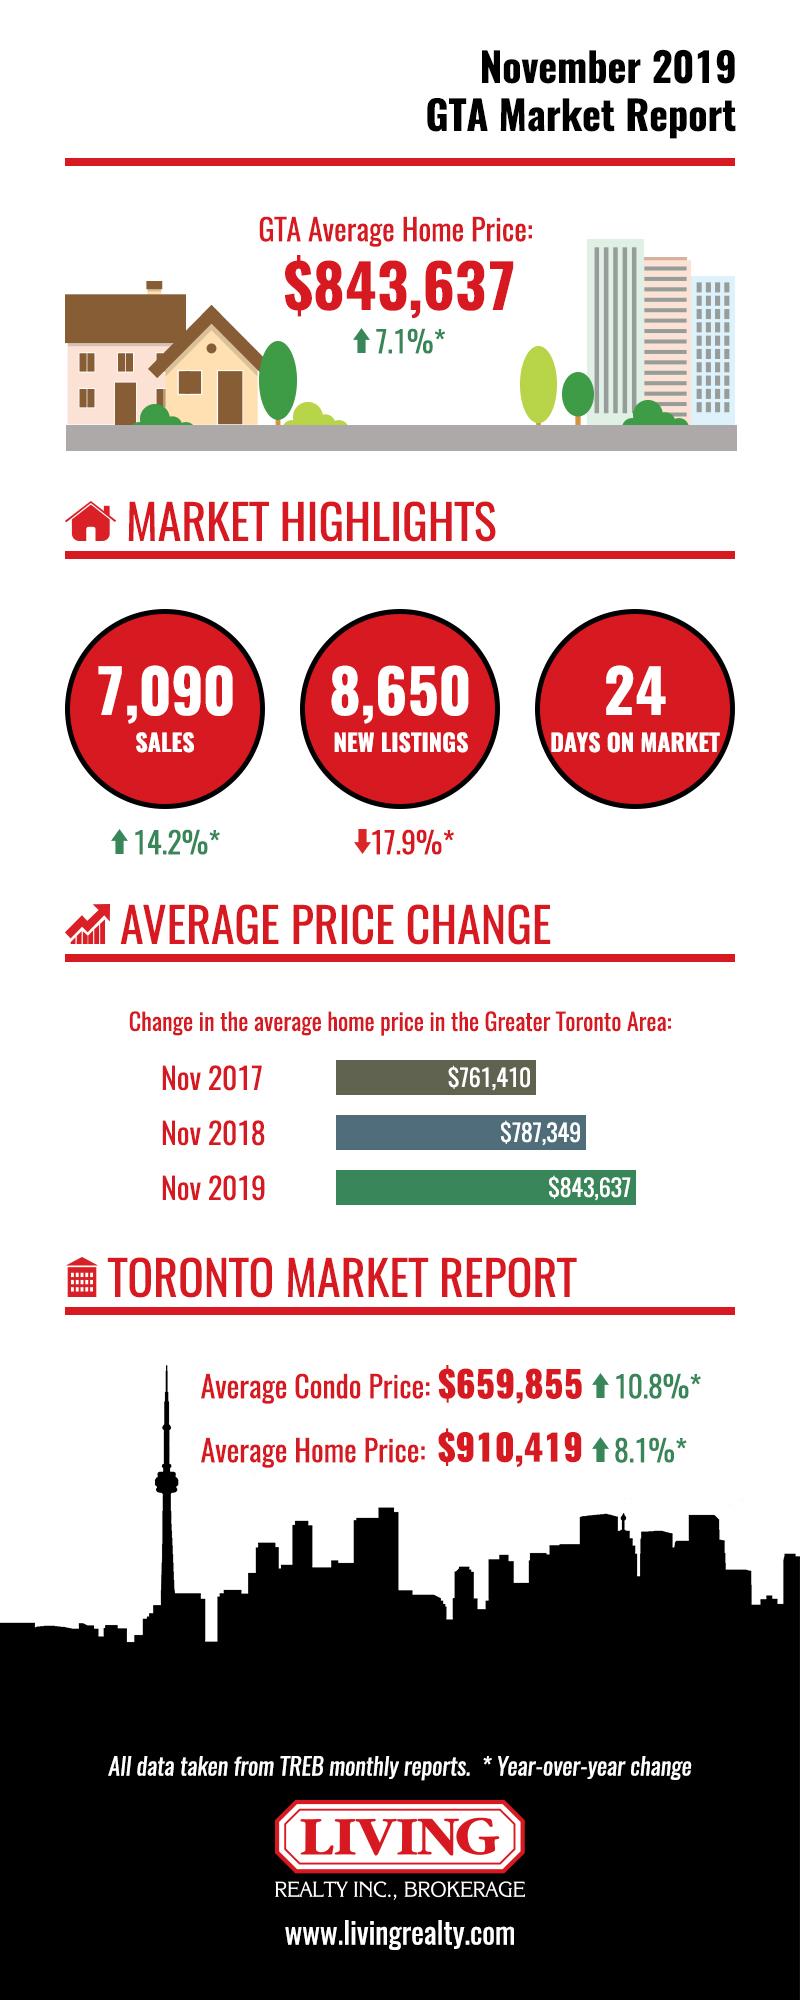 November 2019 GTA housing market report graph